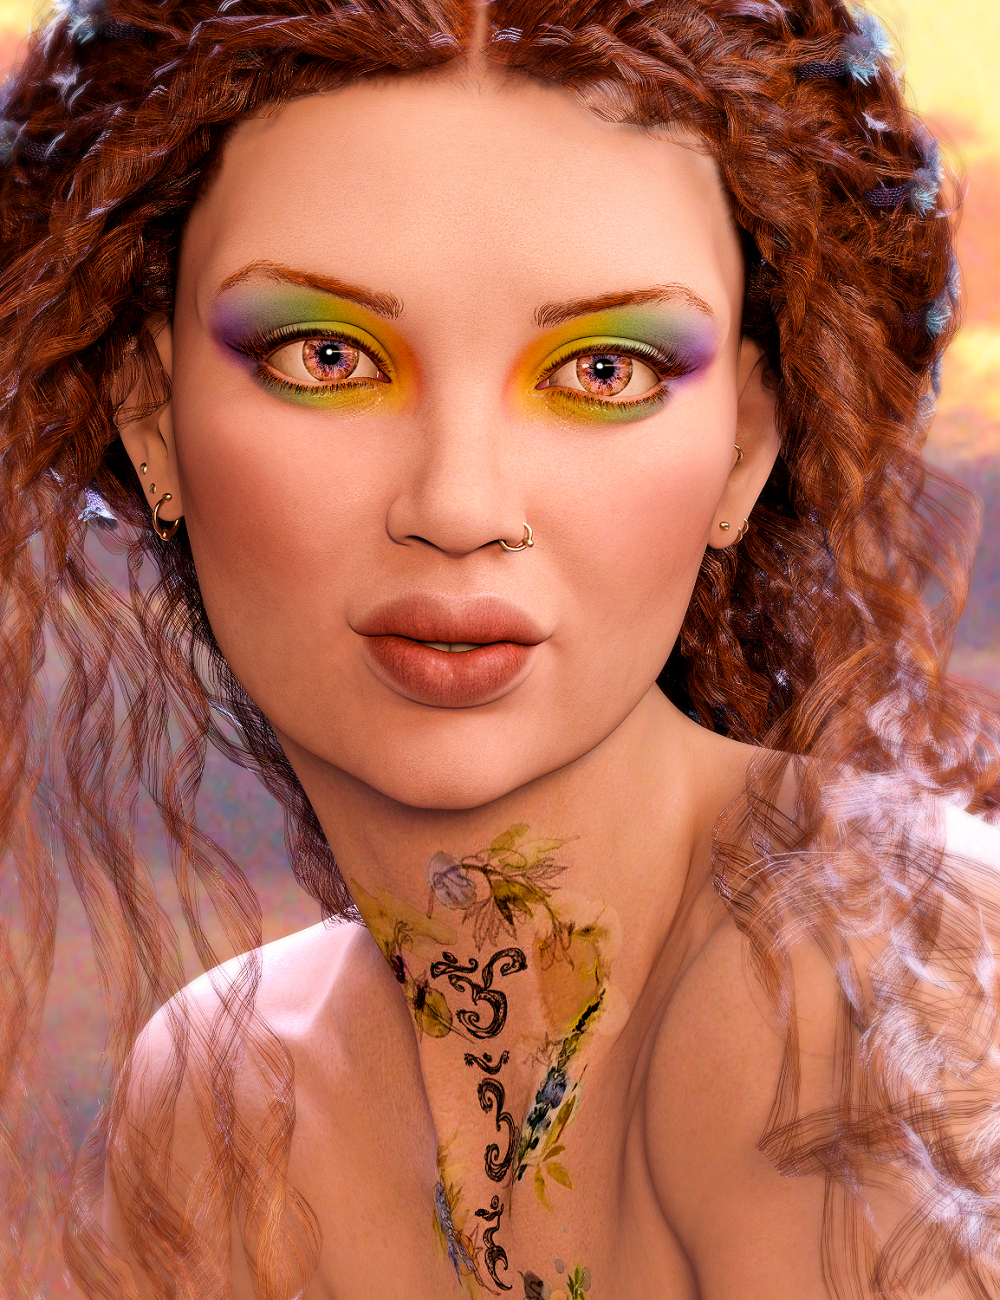 Mireille HD for Genesis 8.1 Female by: Spiritfoxy, 3D Models by Daz 3D